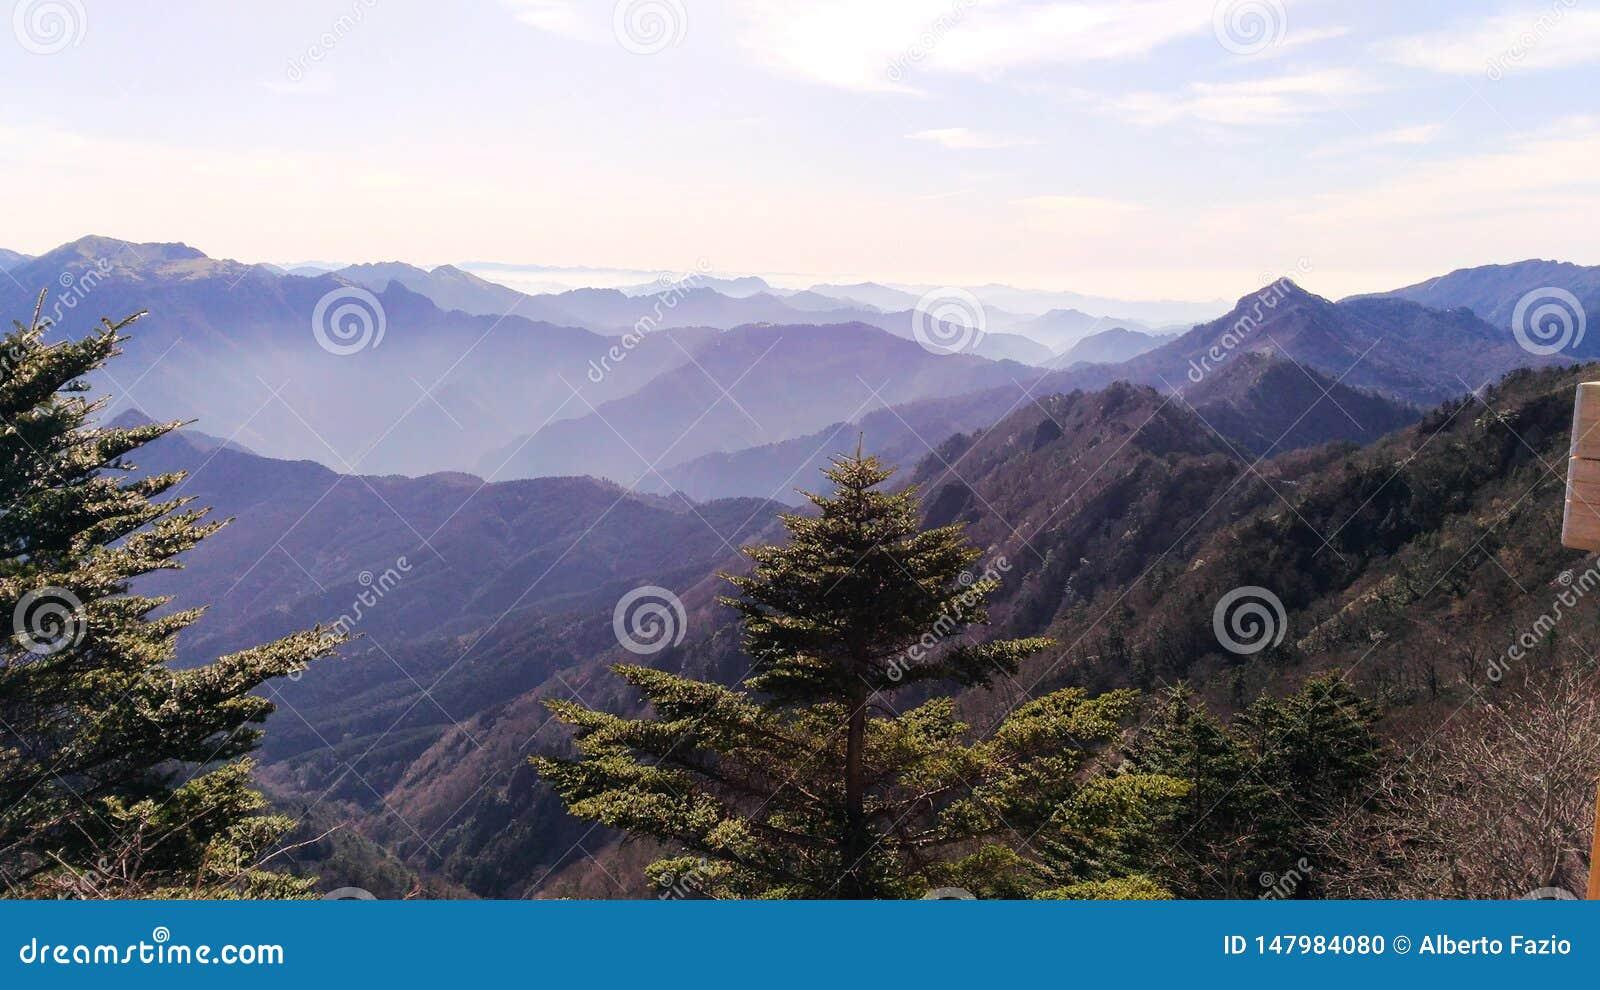 Shaded japanese mountains